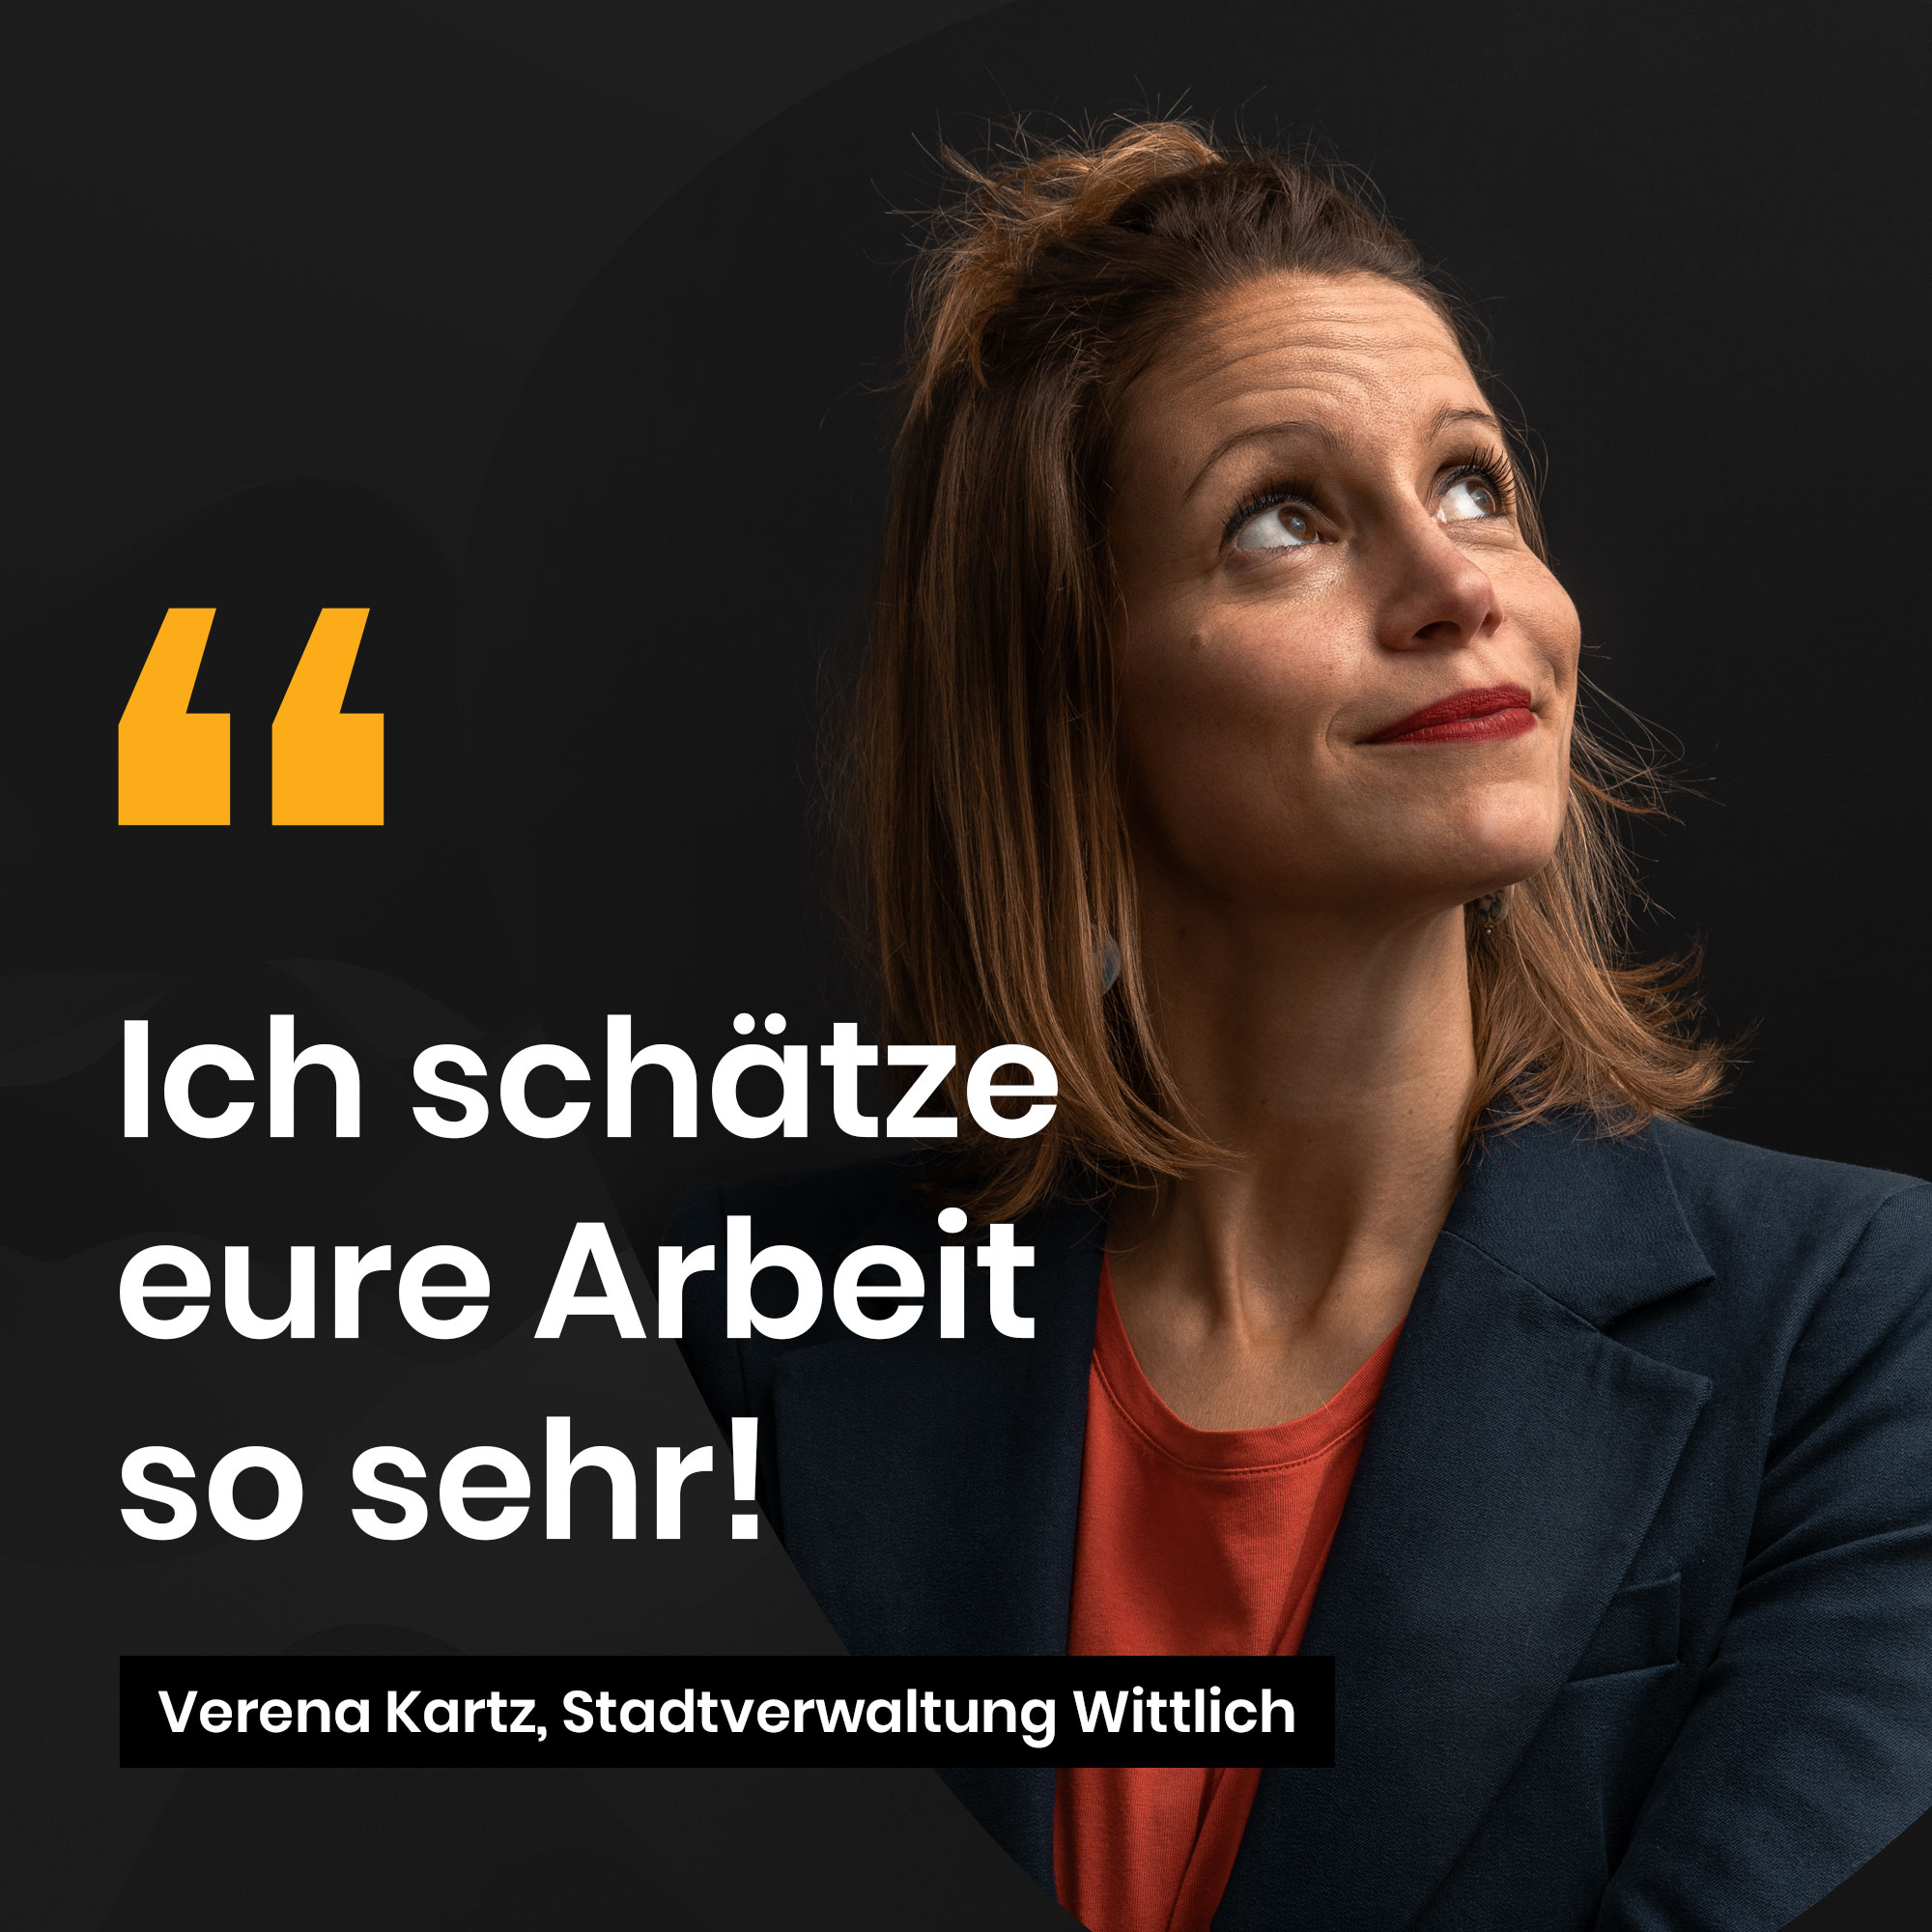 Verena Kartz, Stadtverwaltung Wittlich